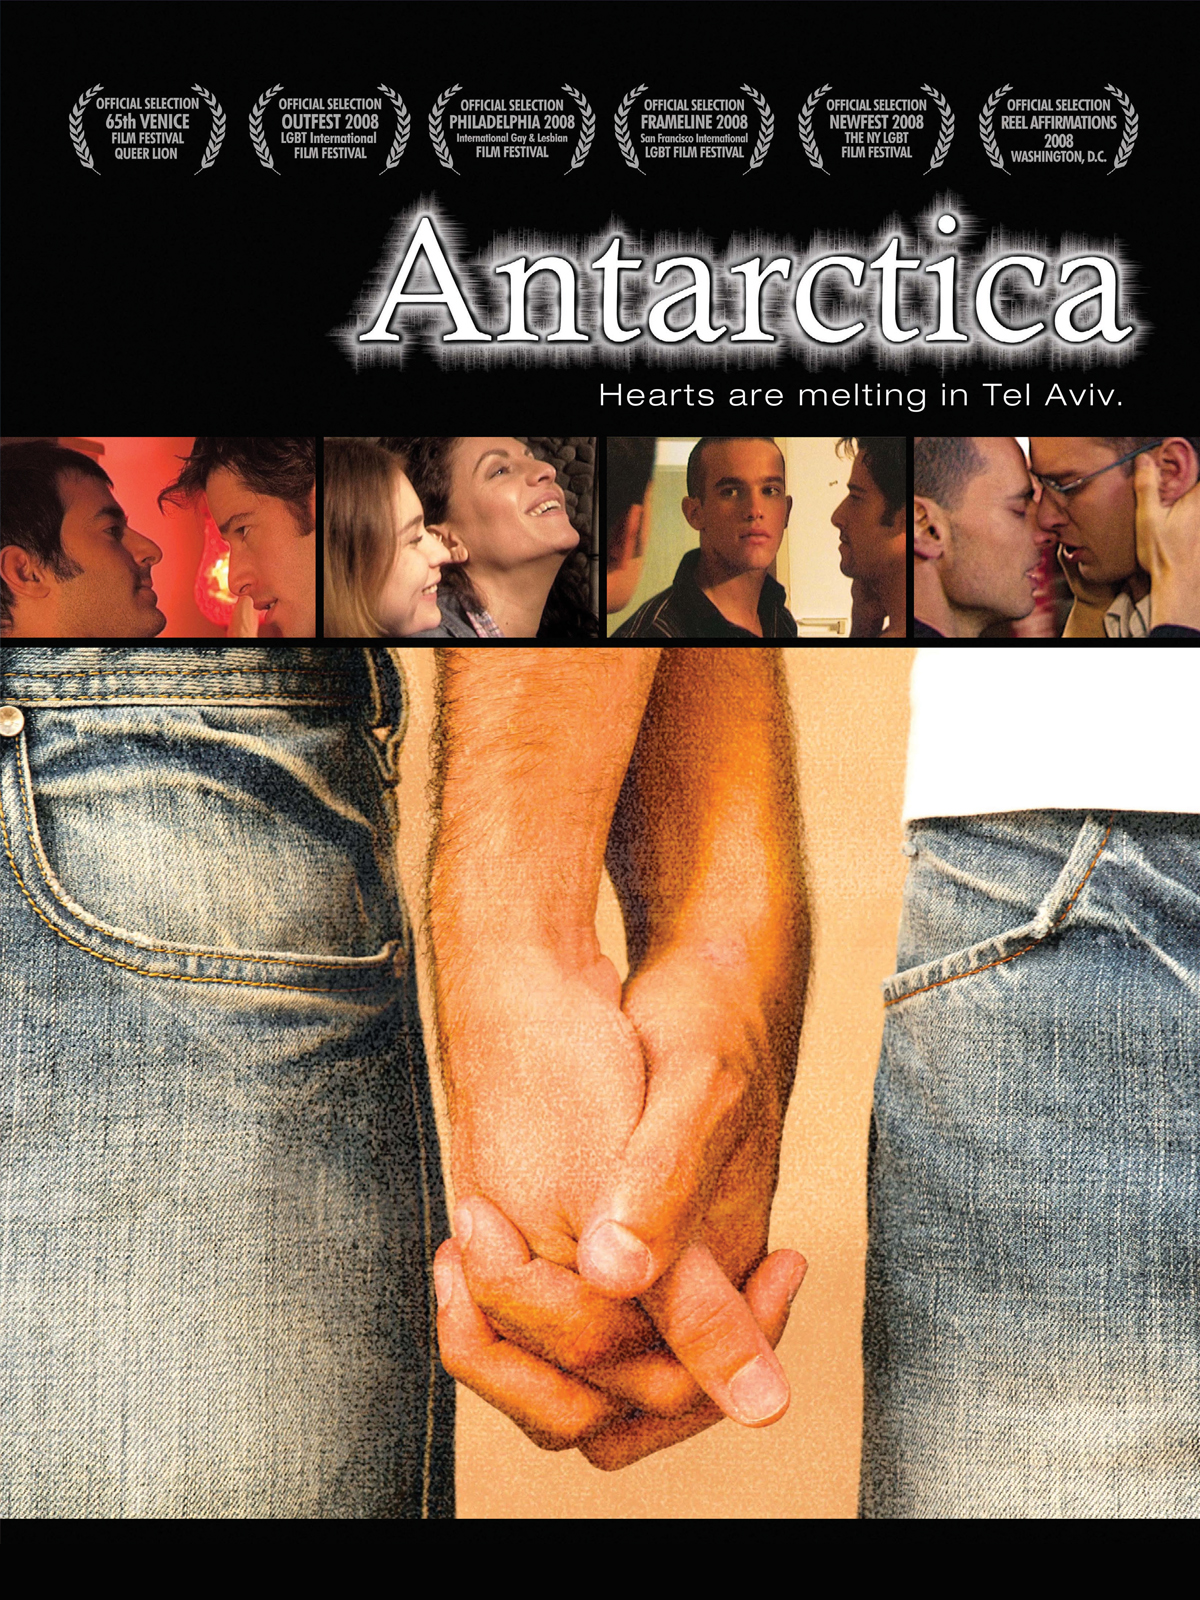 Here-BB_Antarctica-Full-Image-en-US.jpg